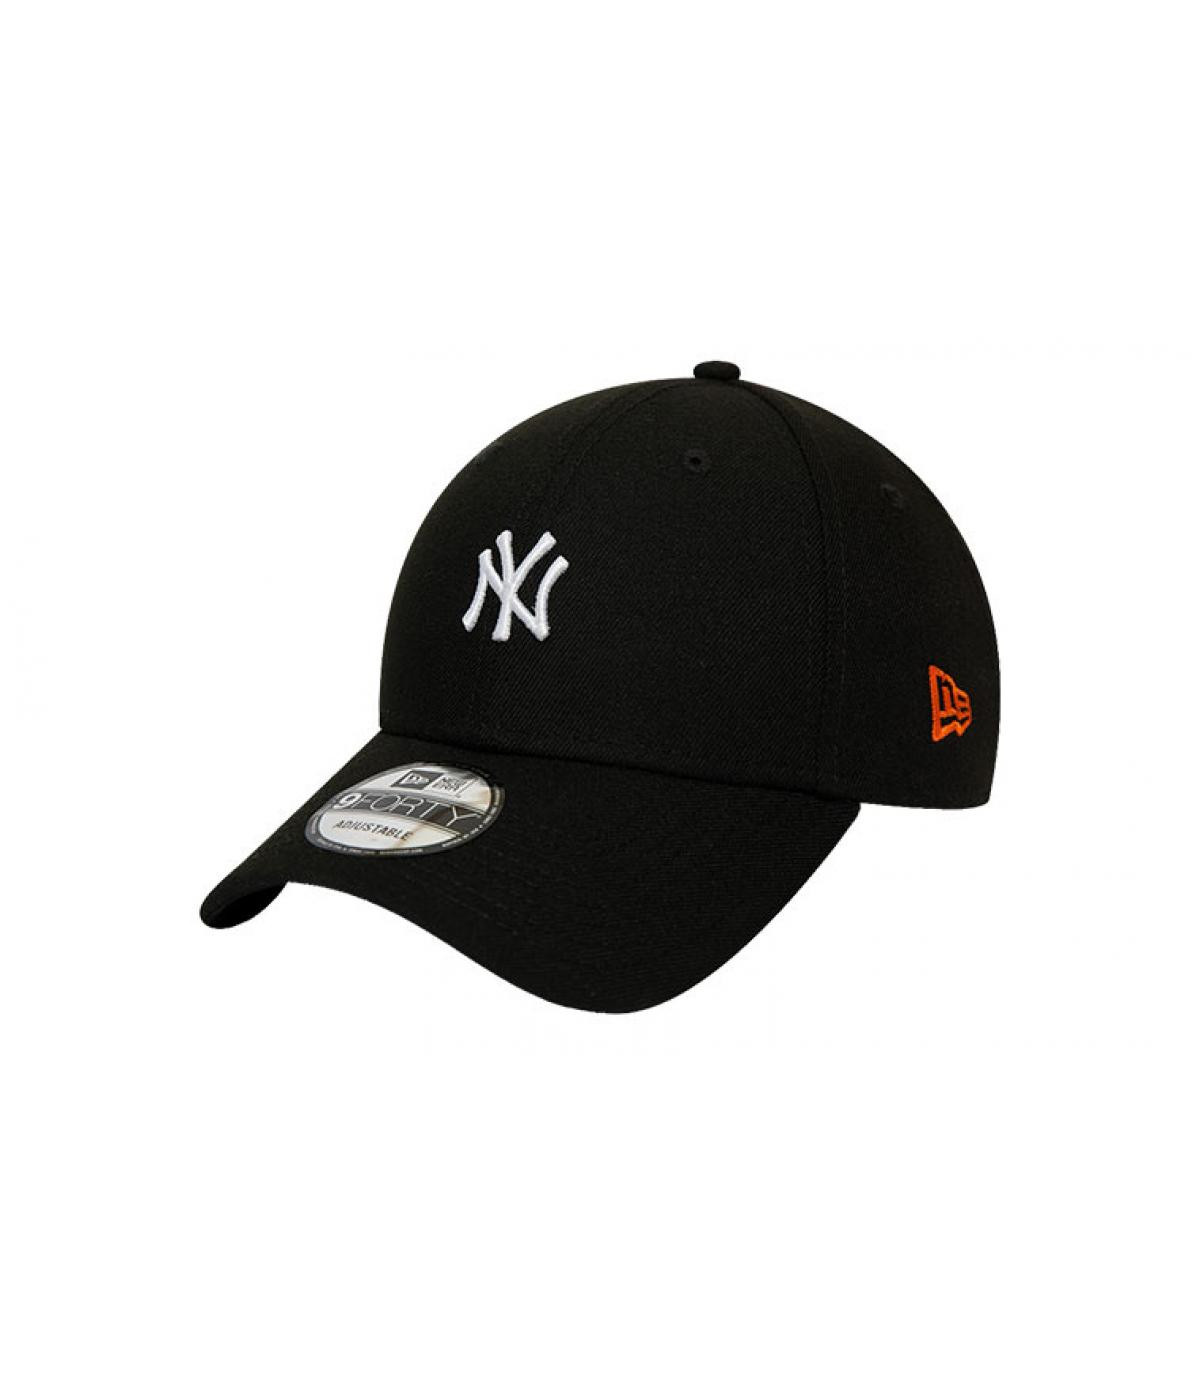 Details Cap MLB Tour NY 940 black - Abbildung 2